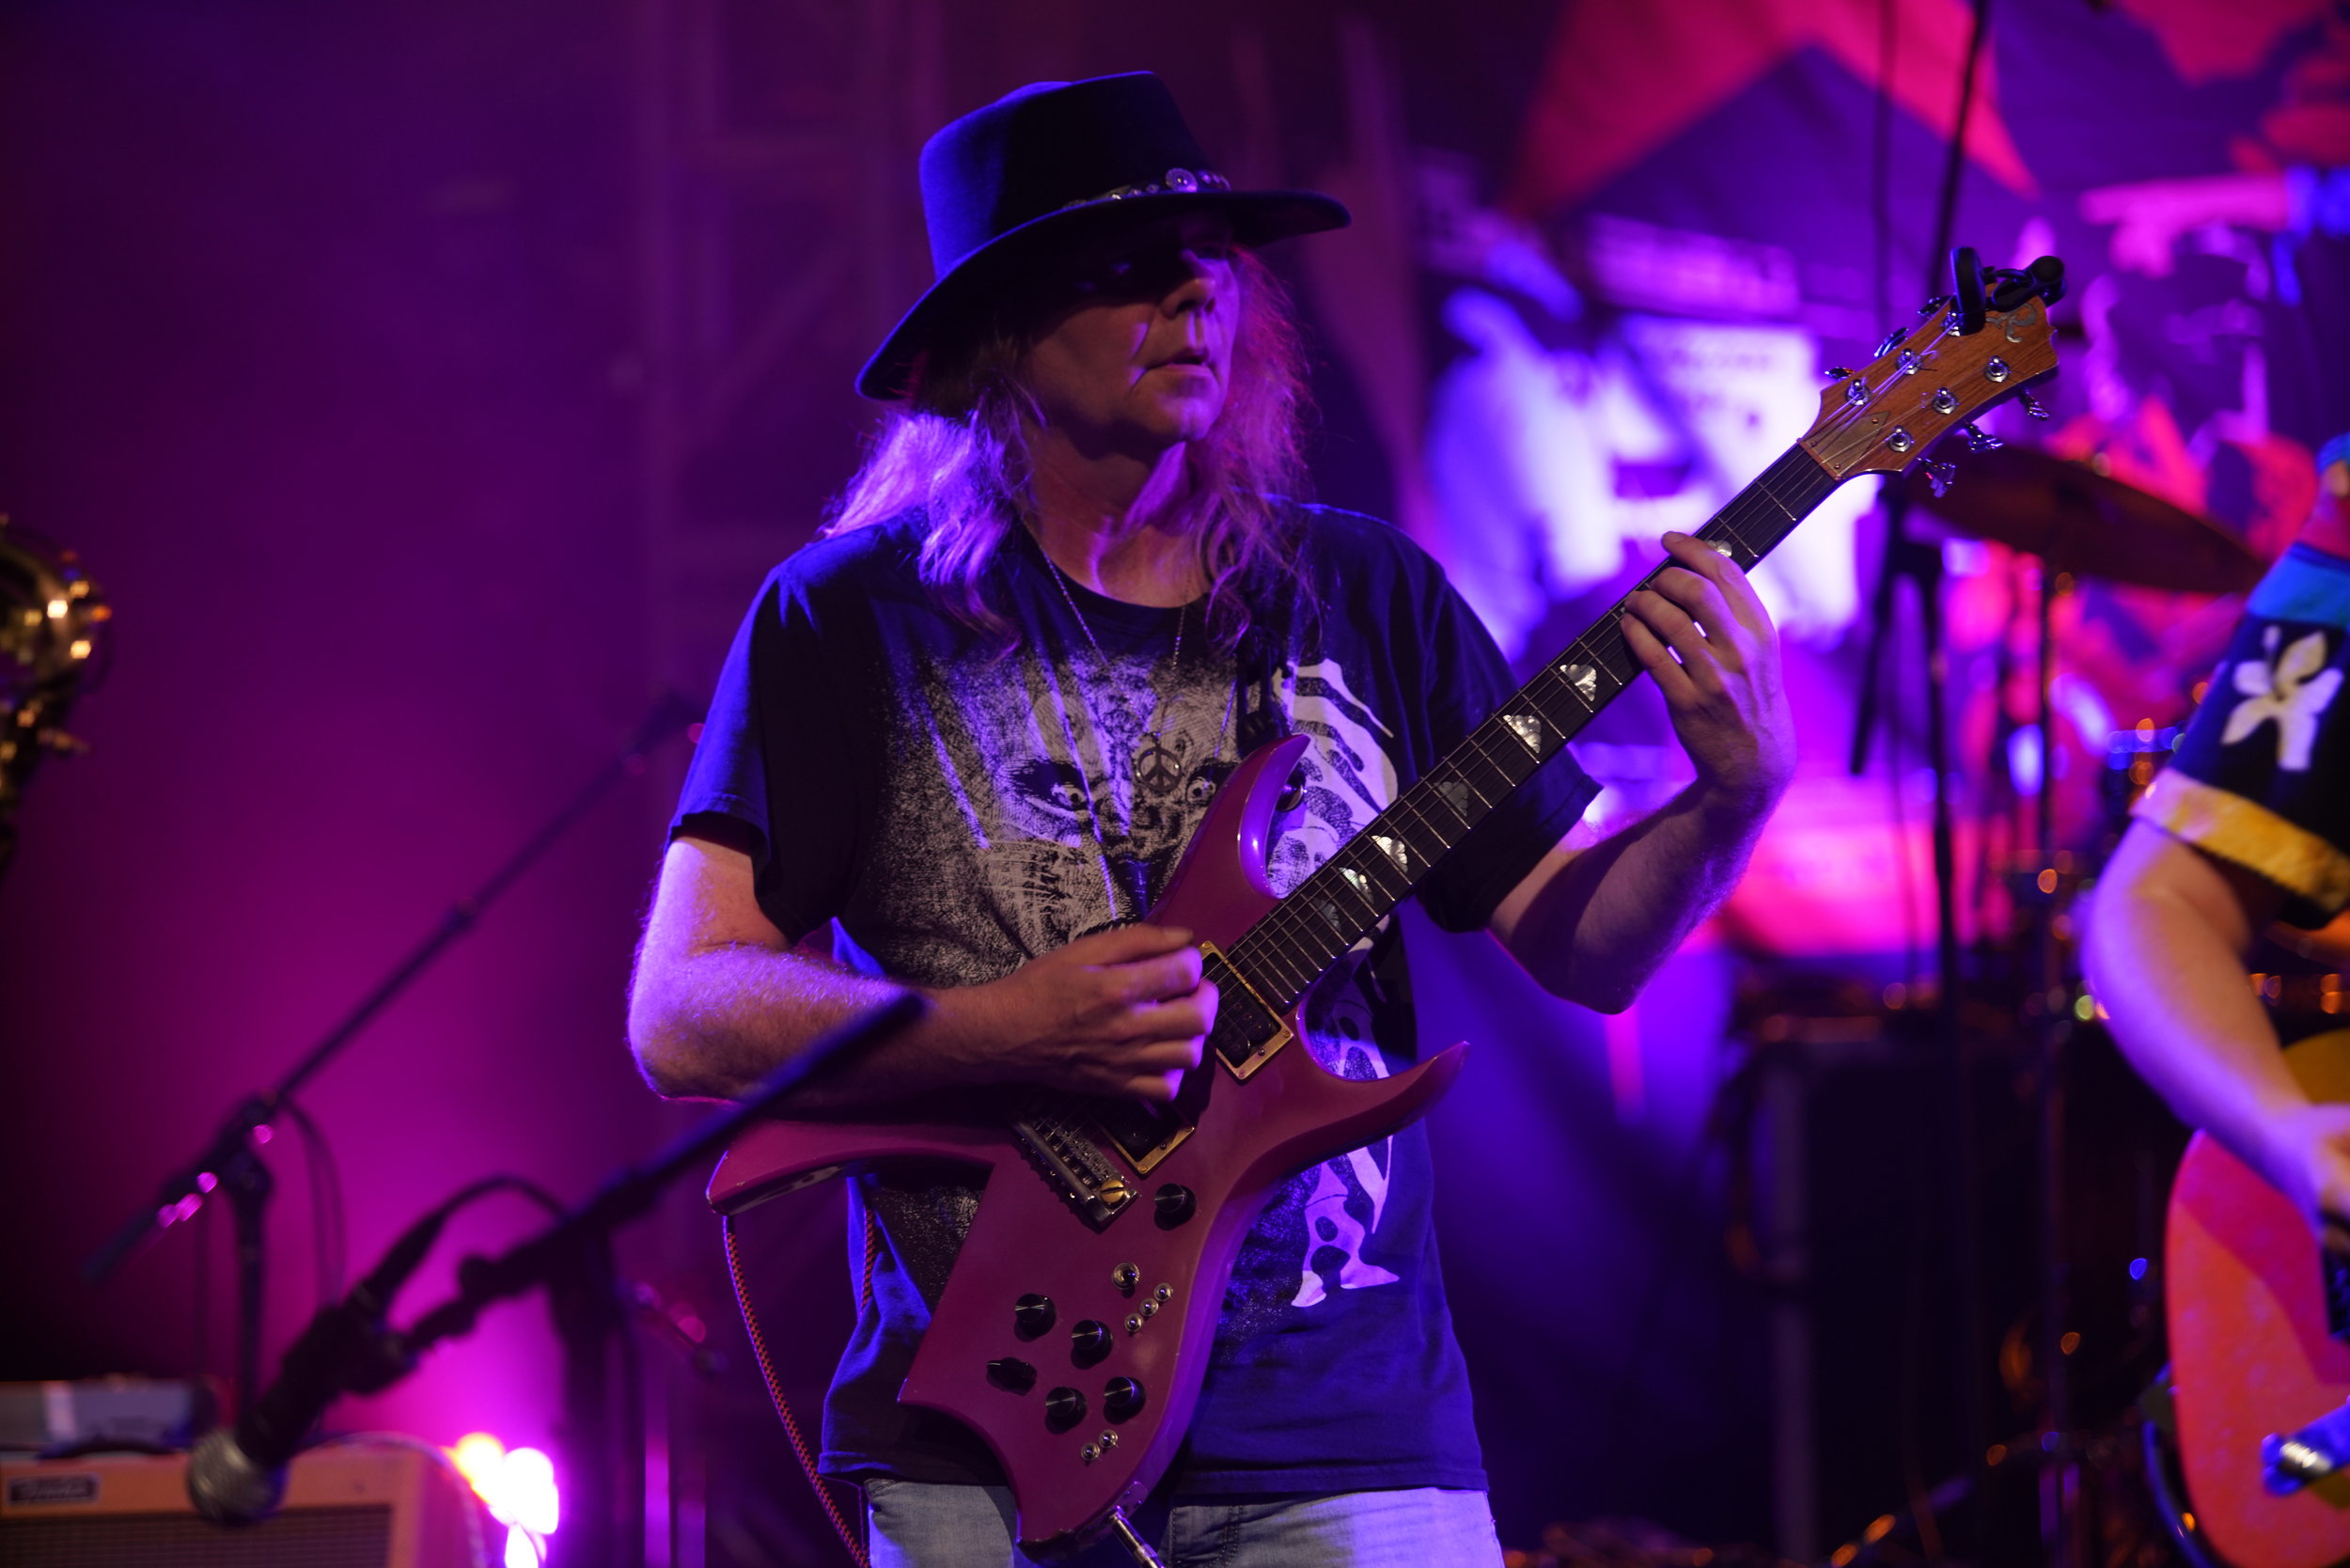 Rich Fisanick - lead guitarist